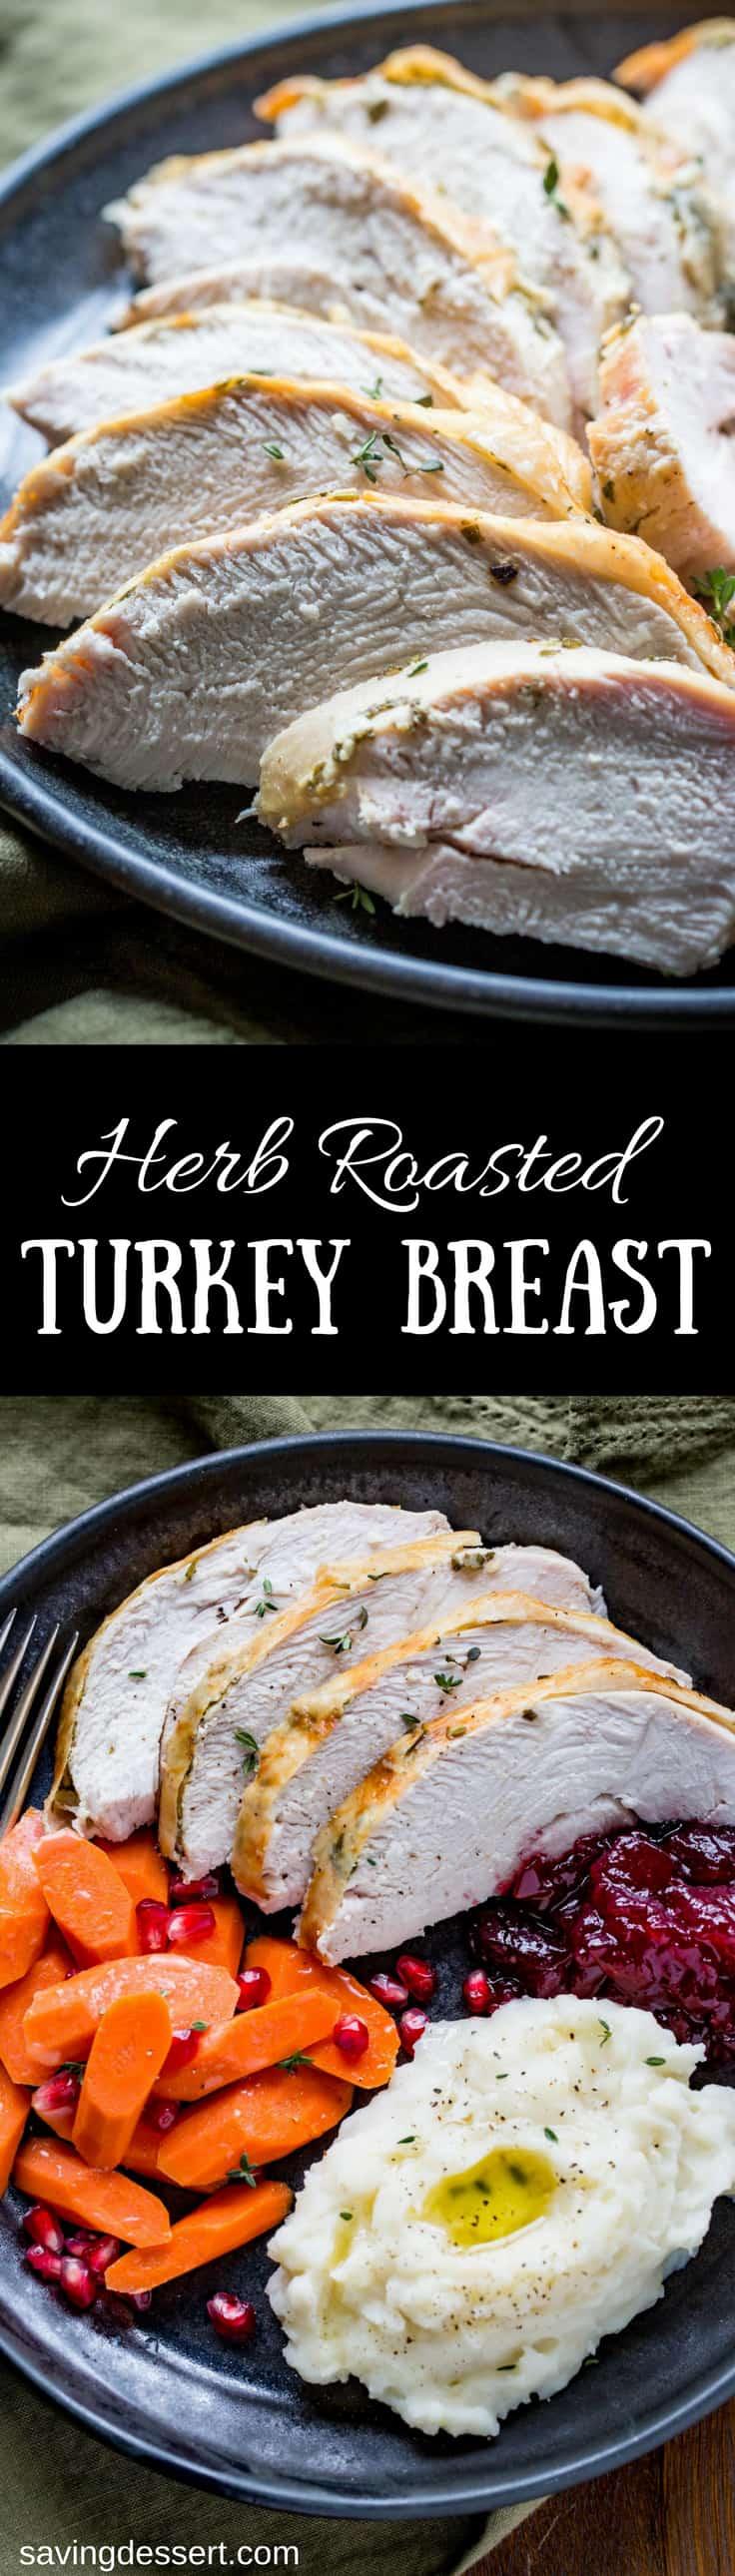 Herb Roasted Turkey Breast ~ an easy, foolproof method for a well seasoned, tender and juicy turkey breast! www.savingdessert.com #savingroomfordessert #thanksgiving #turkey #turkeybreast #herbroastedturkey